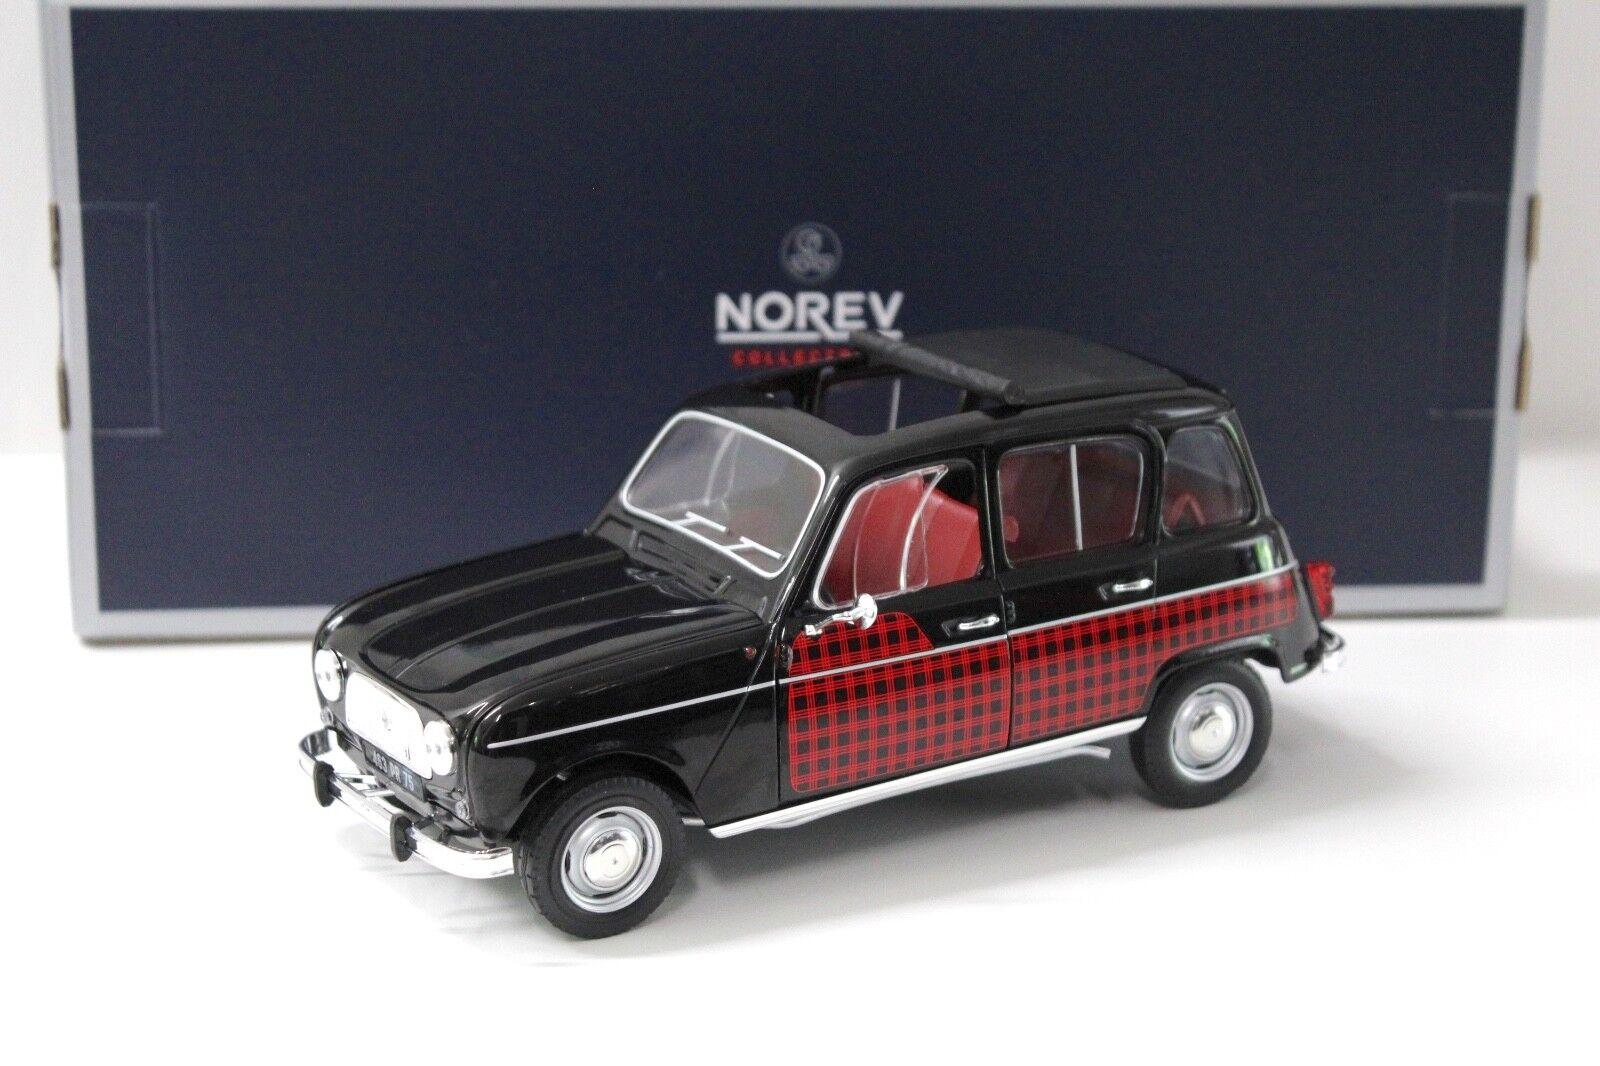 1 18 norev renault 4 parisienne 1964 nero rosso New en Premium-modelcars